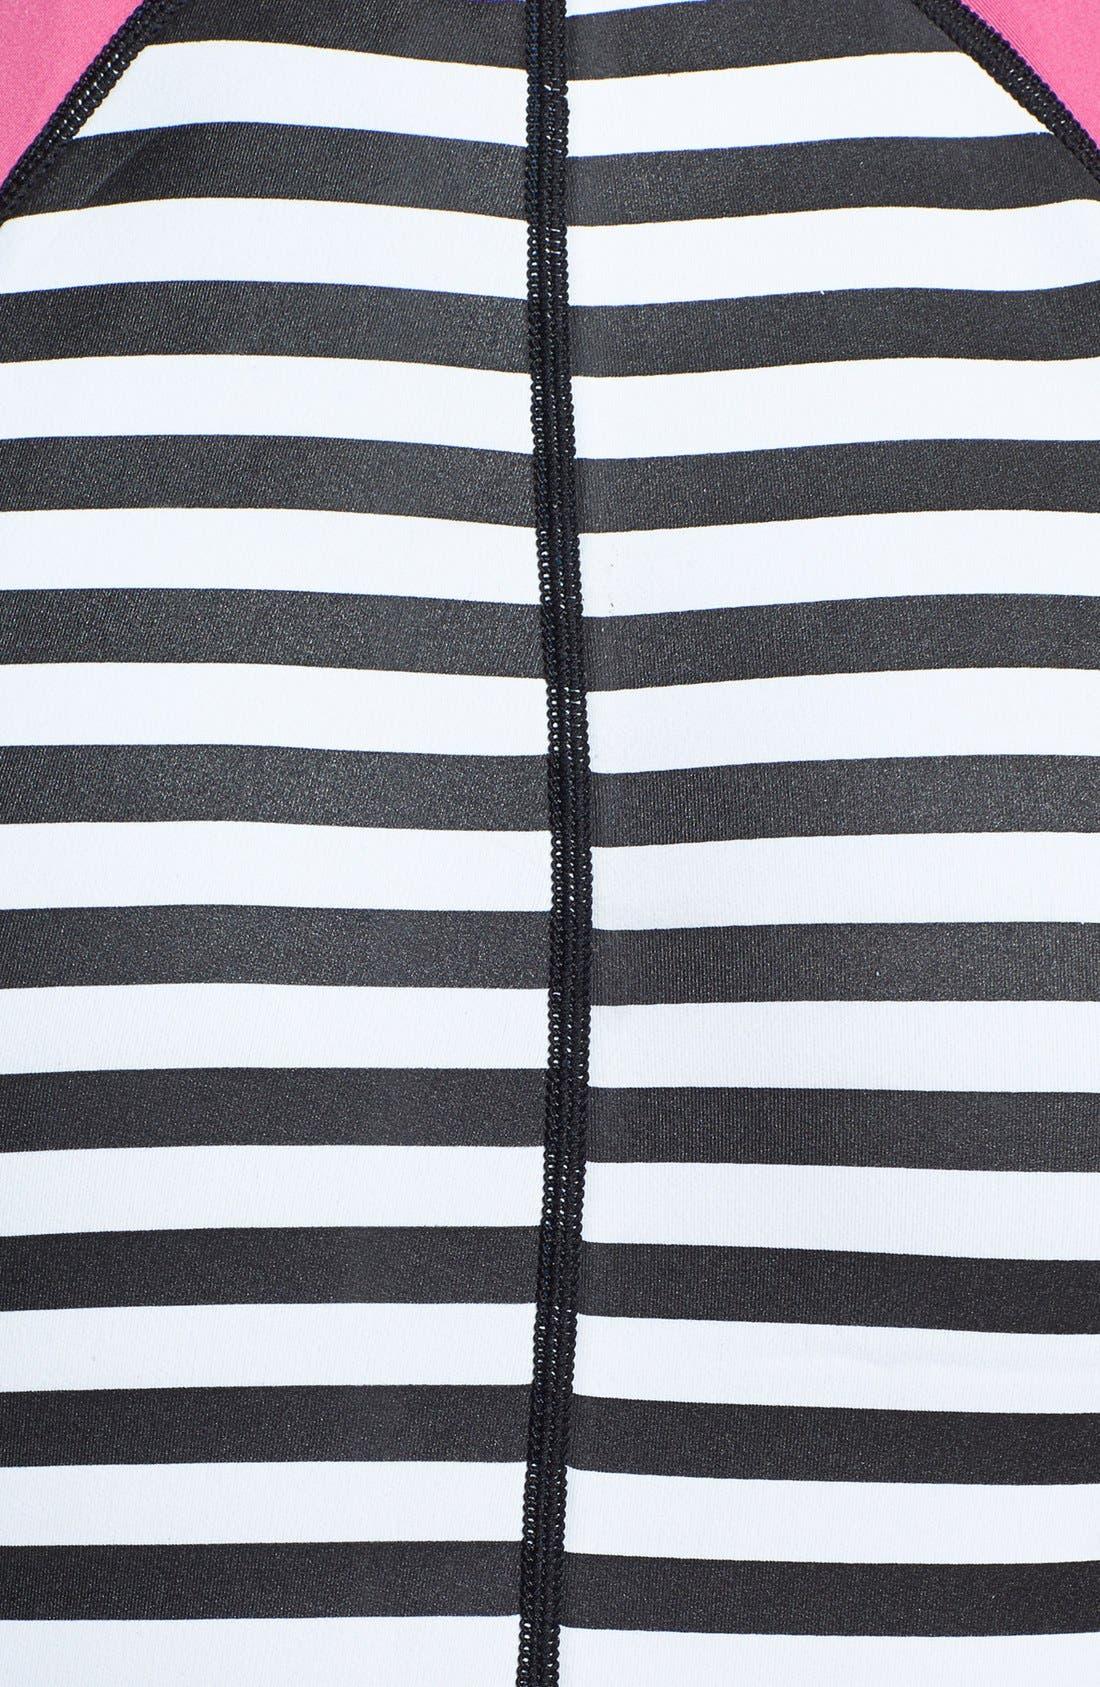 Alternate Image 3  - Roxy 'Hybrid Shortie' One-Piece Swimsuit (UPF 50+)